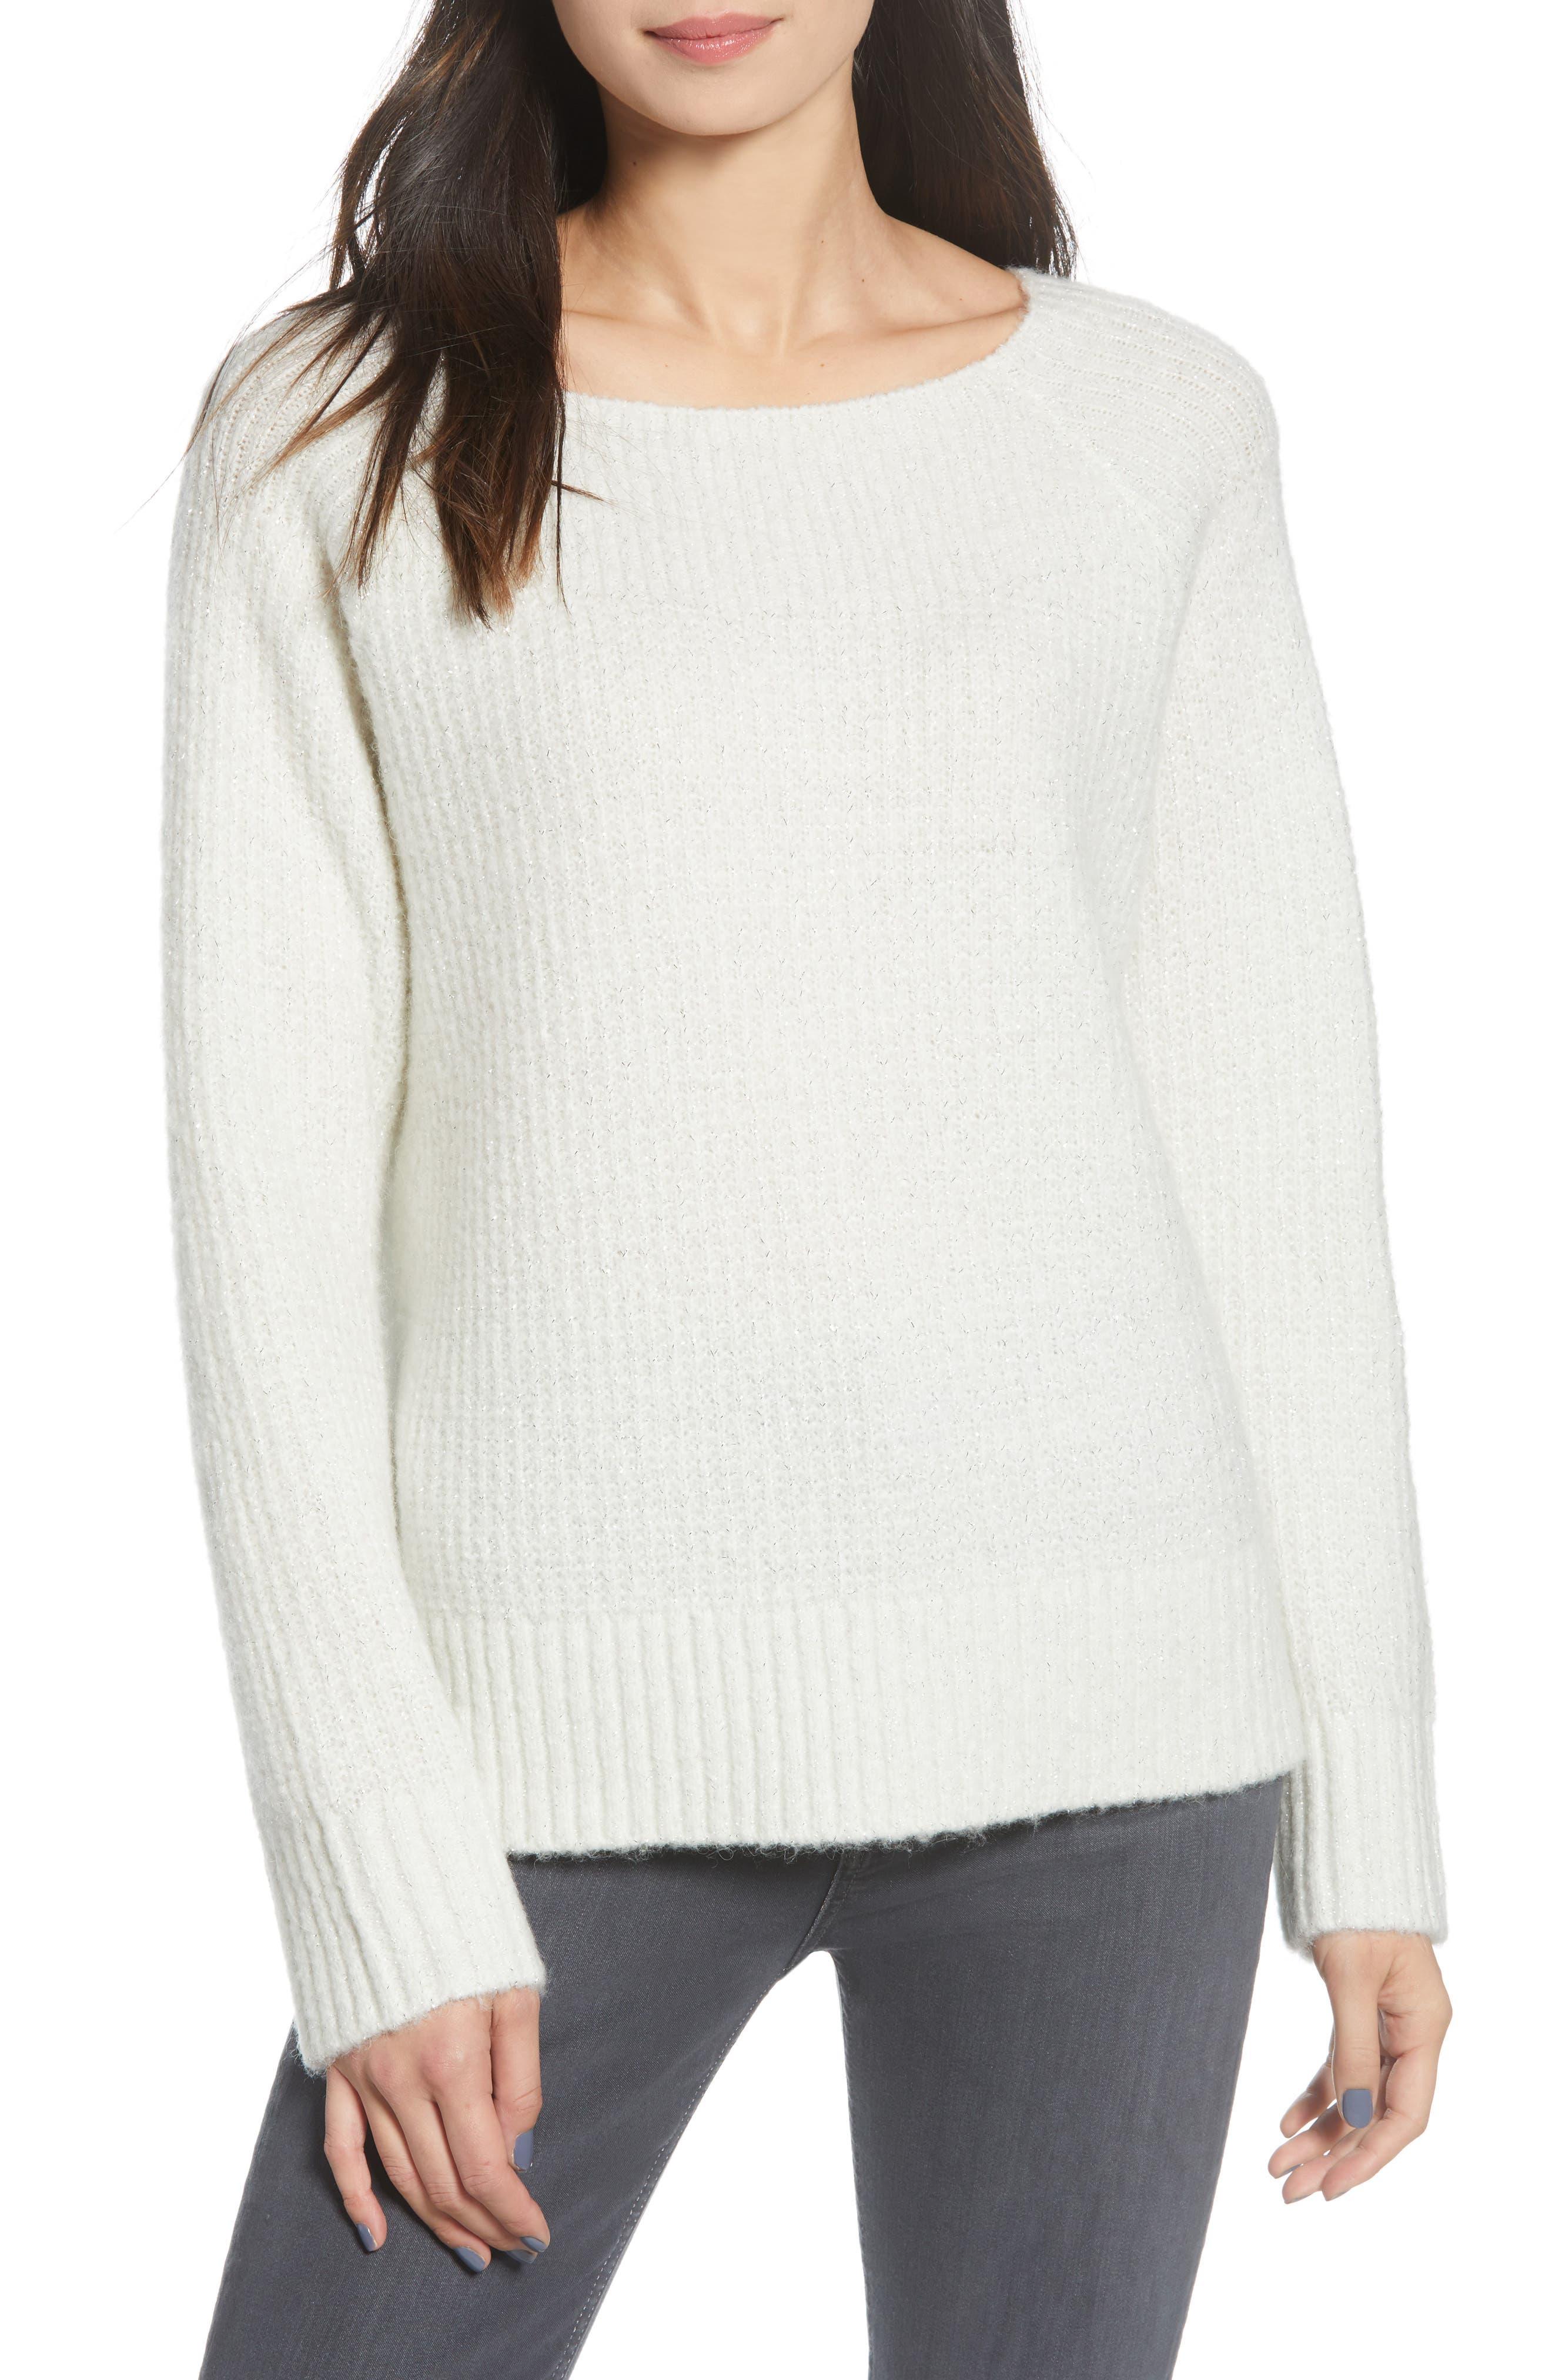 Image of Chelsea28 Rib Metallic Sweater